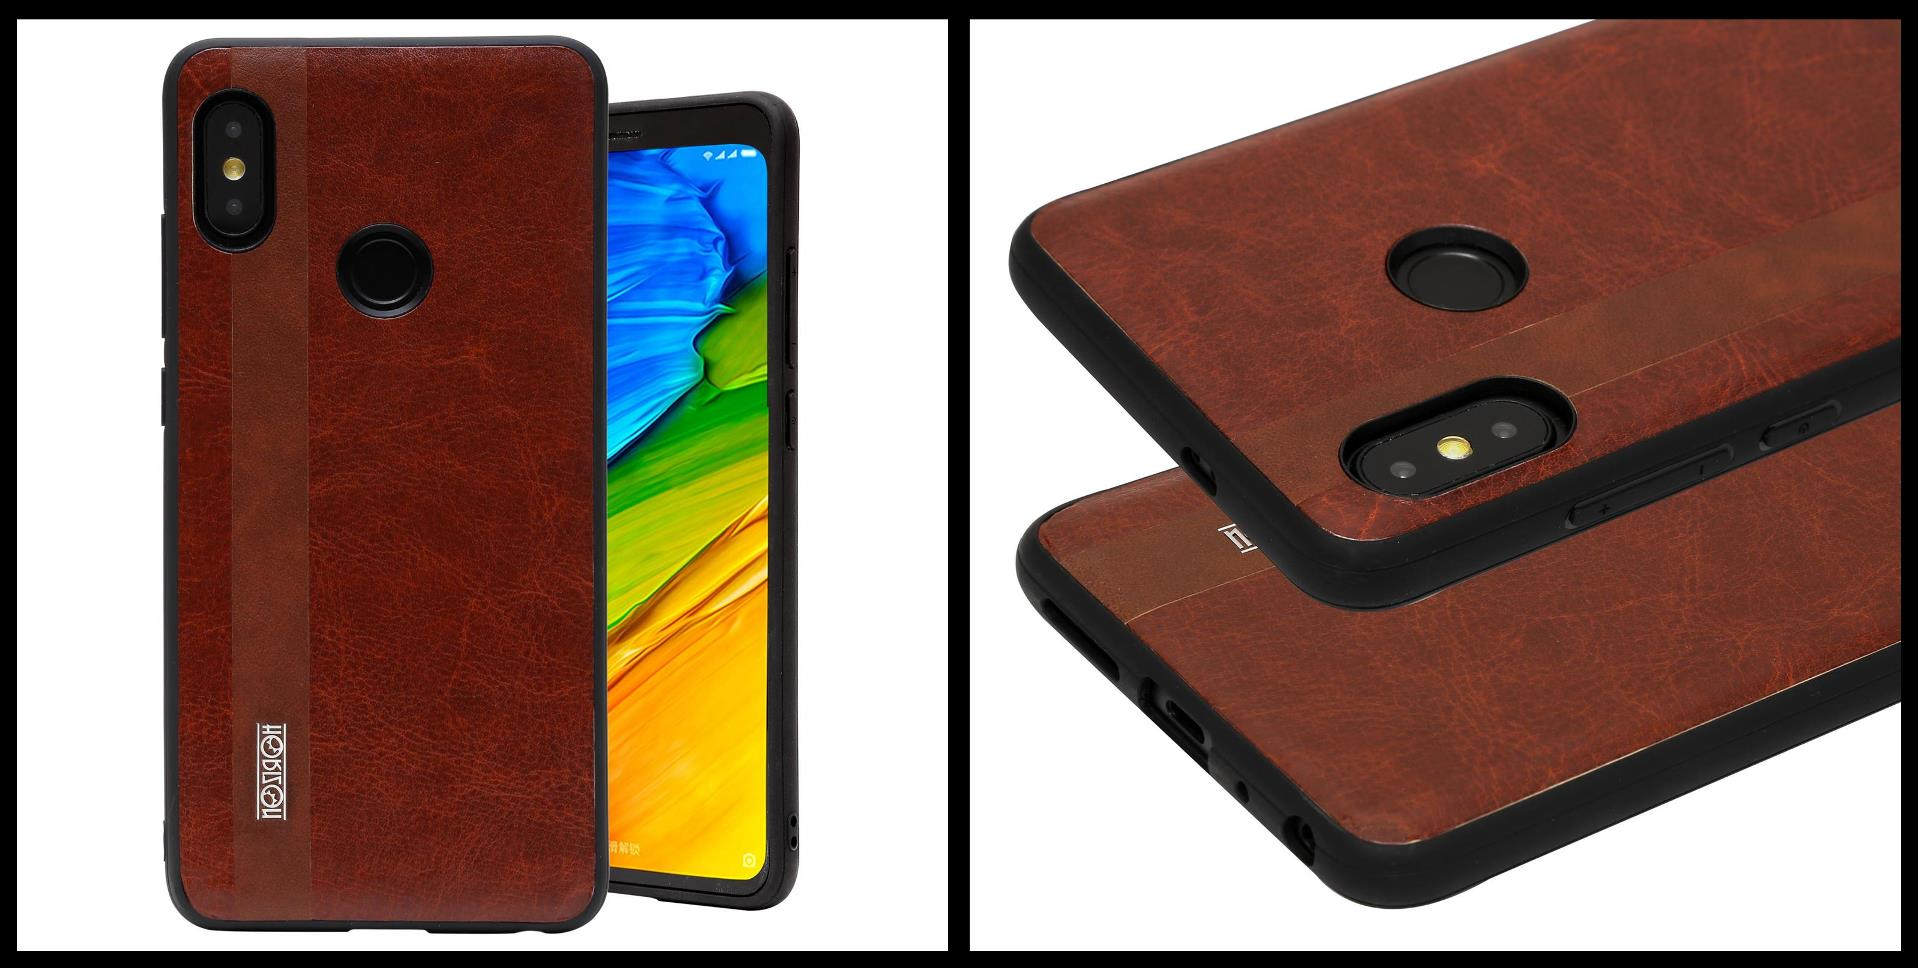 best wholesaler ea674 5e2d4 Noziroh Leather Xiaomi Redmi Note 5 Pro Cover Case Shockproof Slim Design  Brown